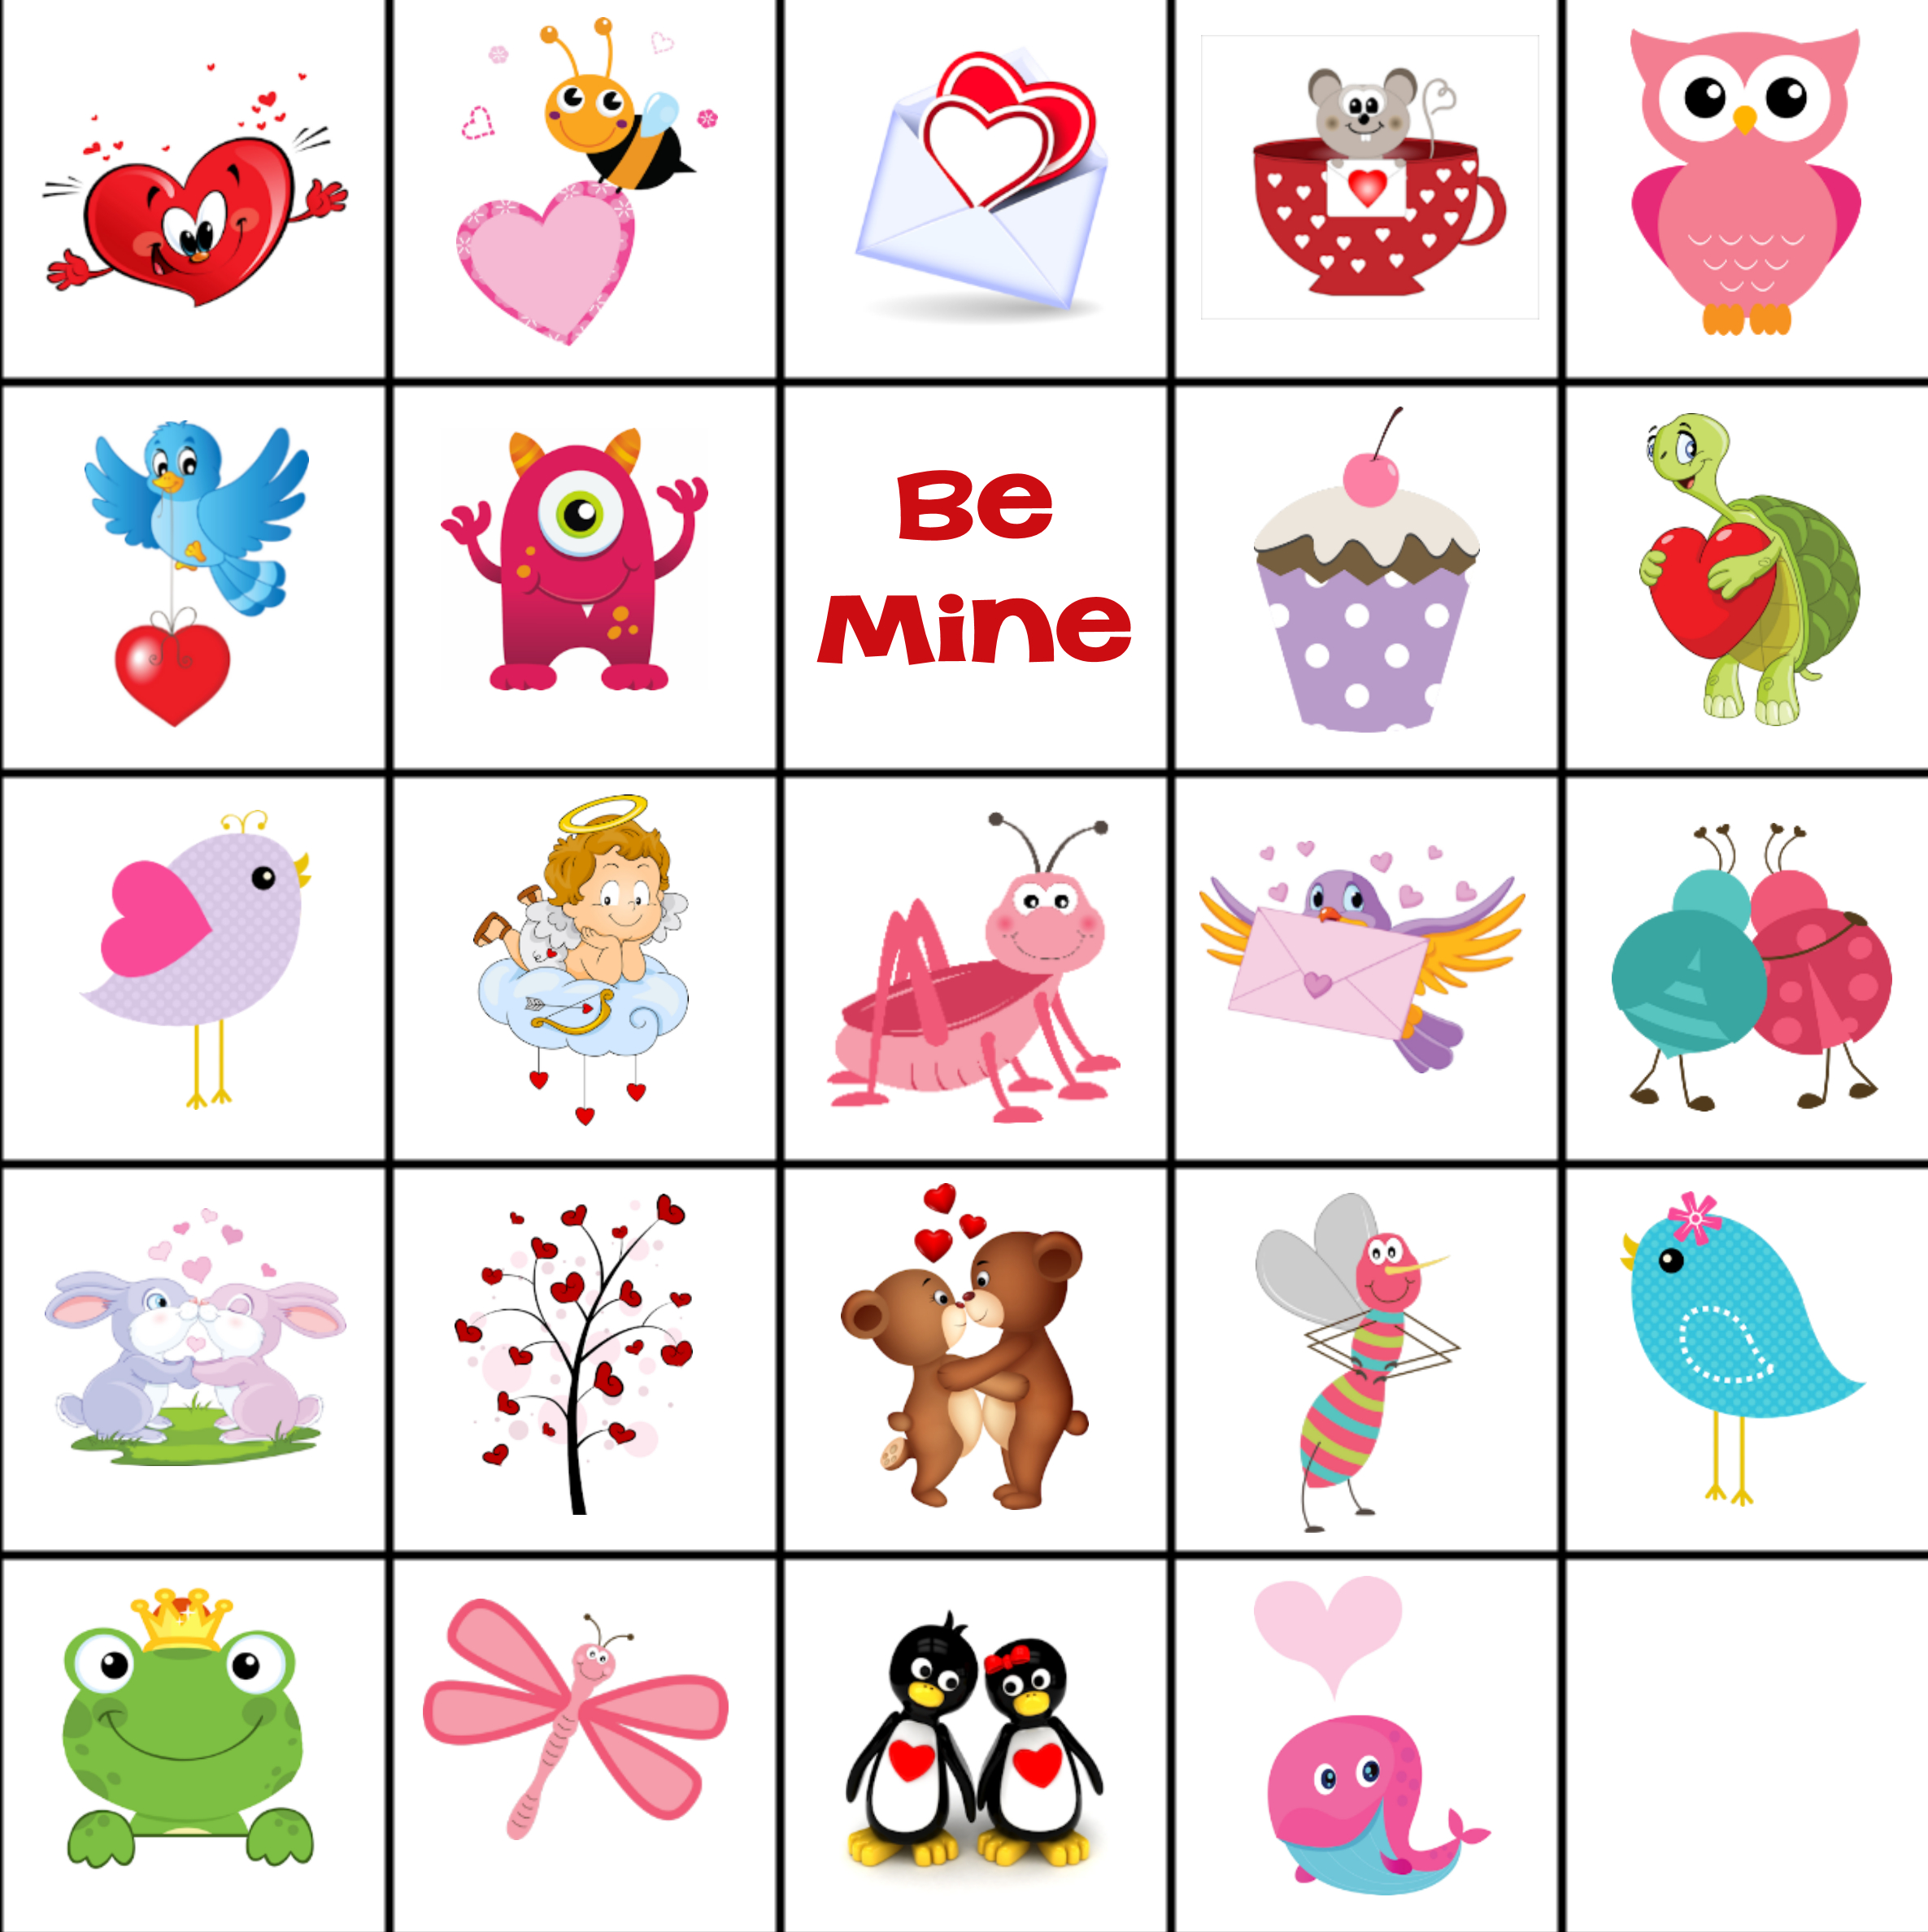 Free Printable Valentine Memory Game - Free Printable Matching Cards